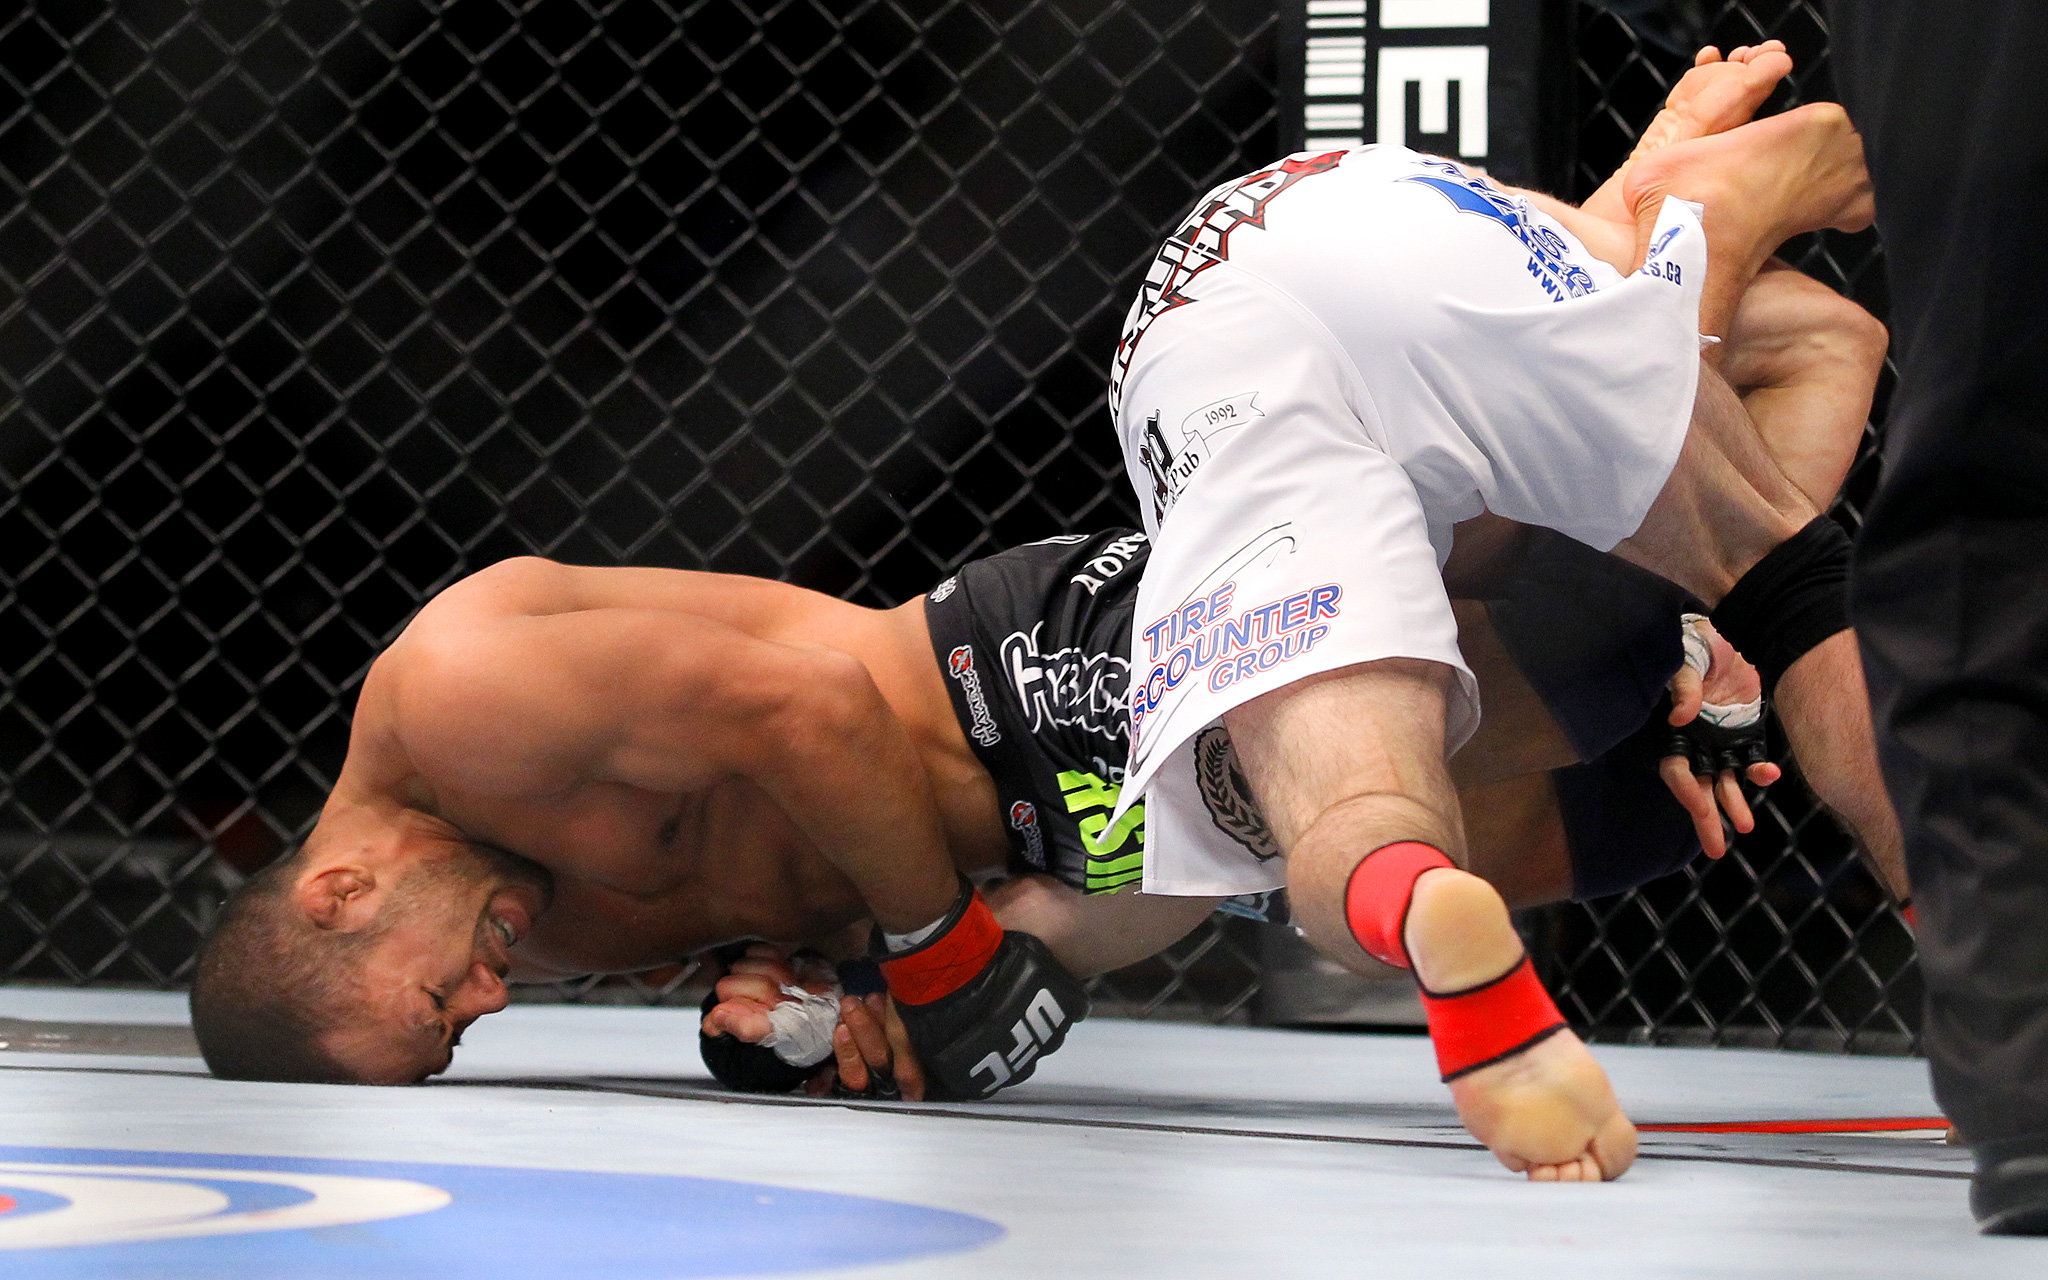 UFC 178 staredowns: Connor McGregor vs Dustin Poirier, Donald Cerrone ...